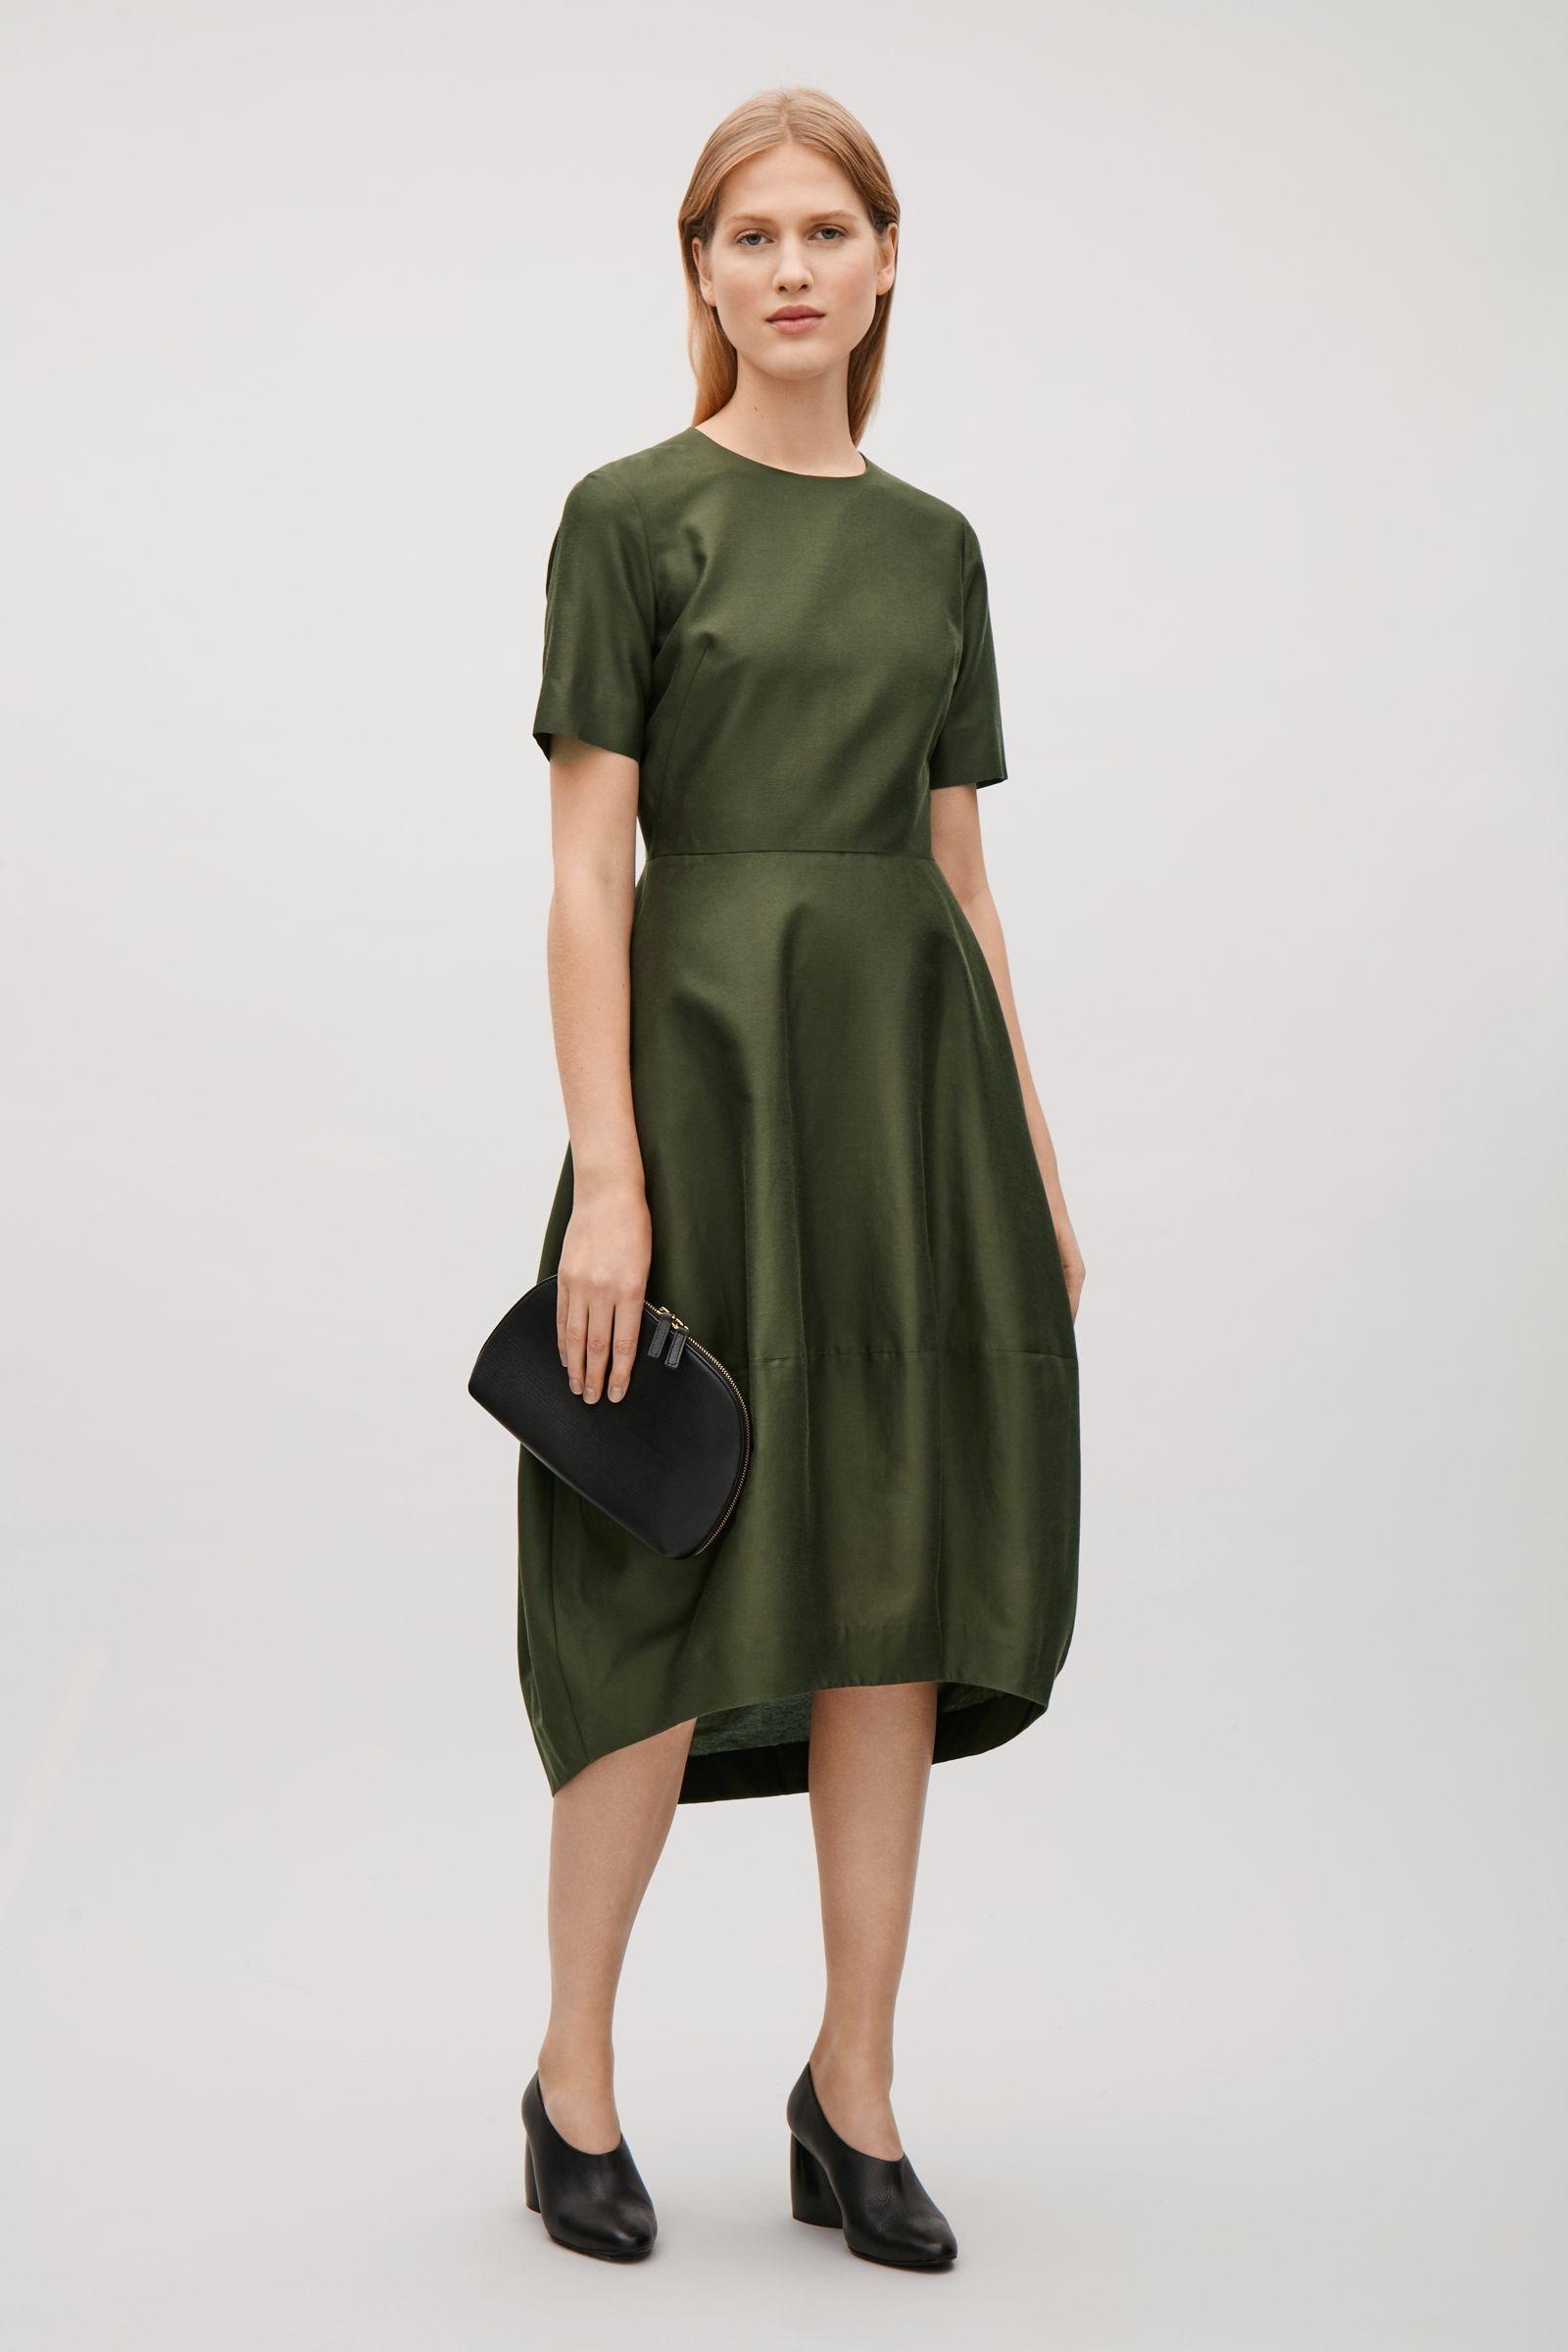 COTTON-SILK DRESS   $135 |COS